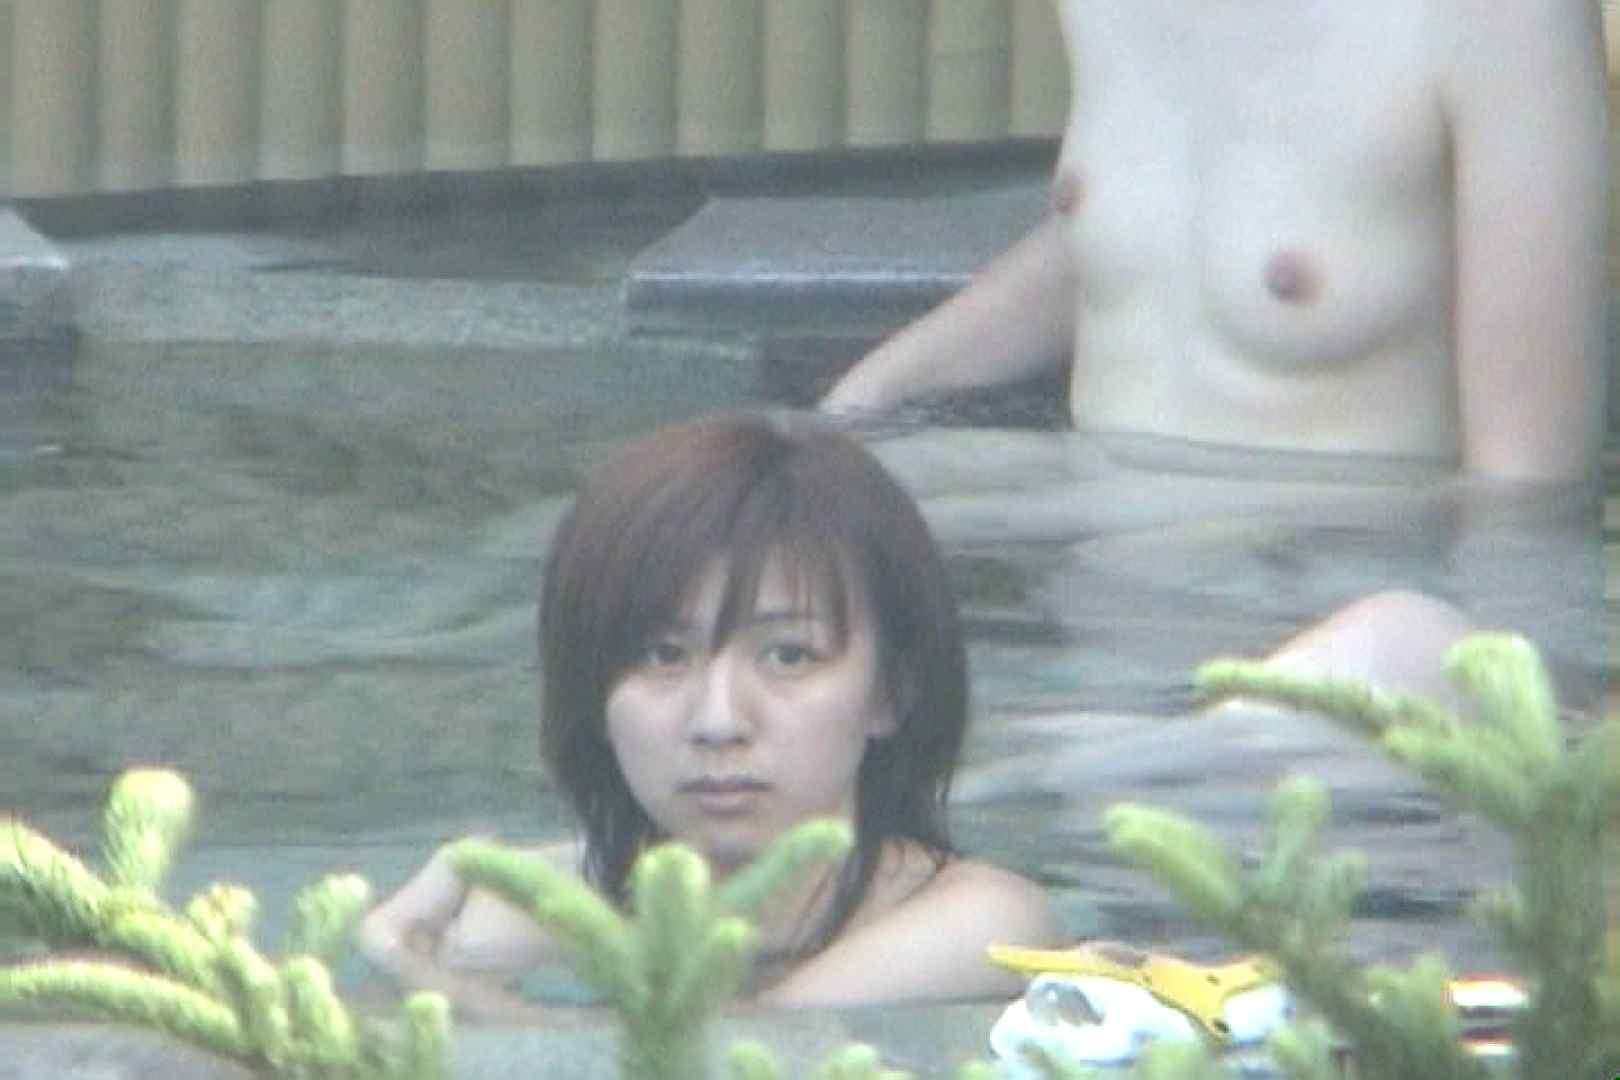 Aquaな露天風呂Vol.77【VIP限定】 露天   盗撮特集  98画像 75